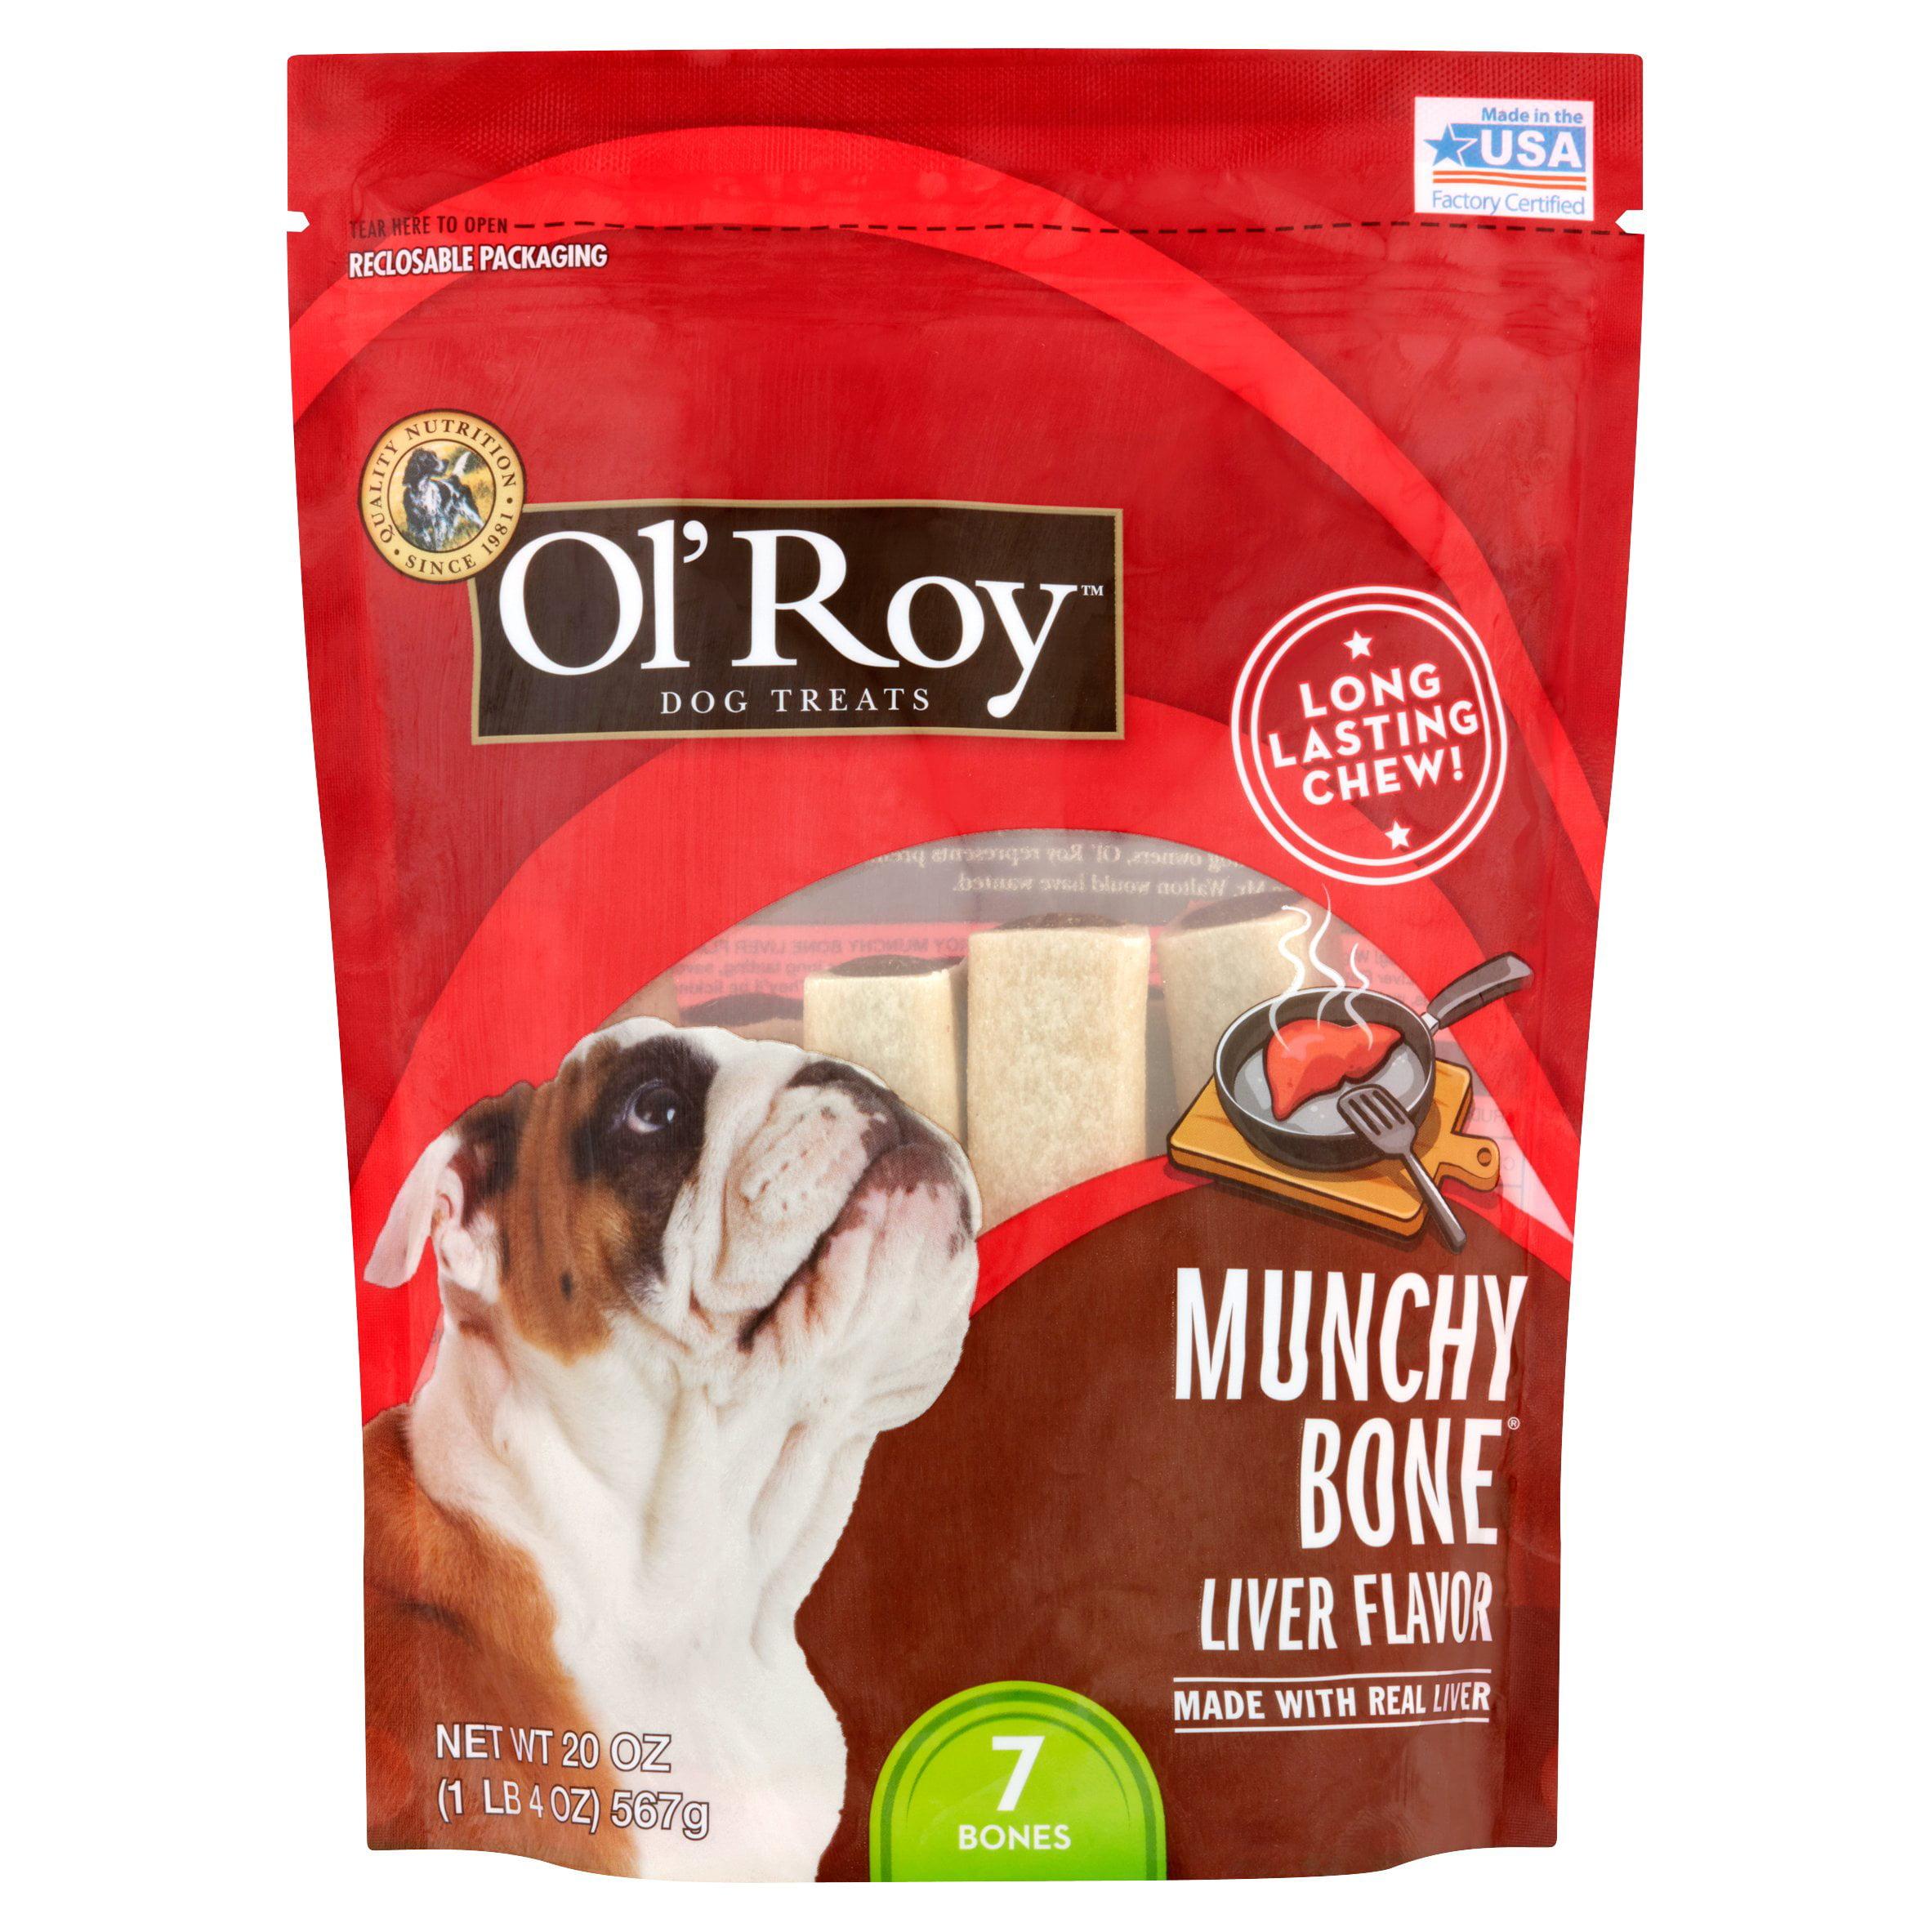 Ol' Roy Munchy Bone Liver Flavor Chews Dog Treats, 7 Ct by Wal-Mart Stores, Inc.